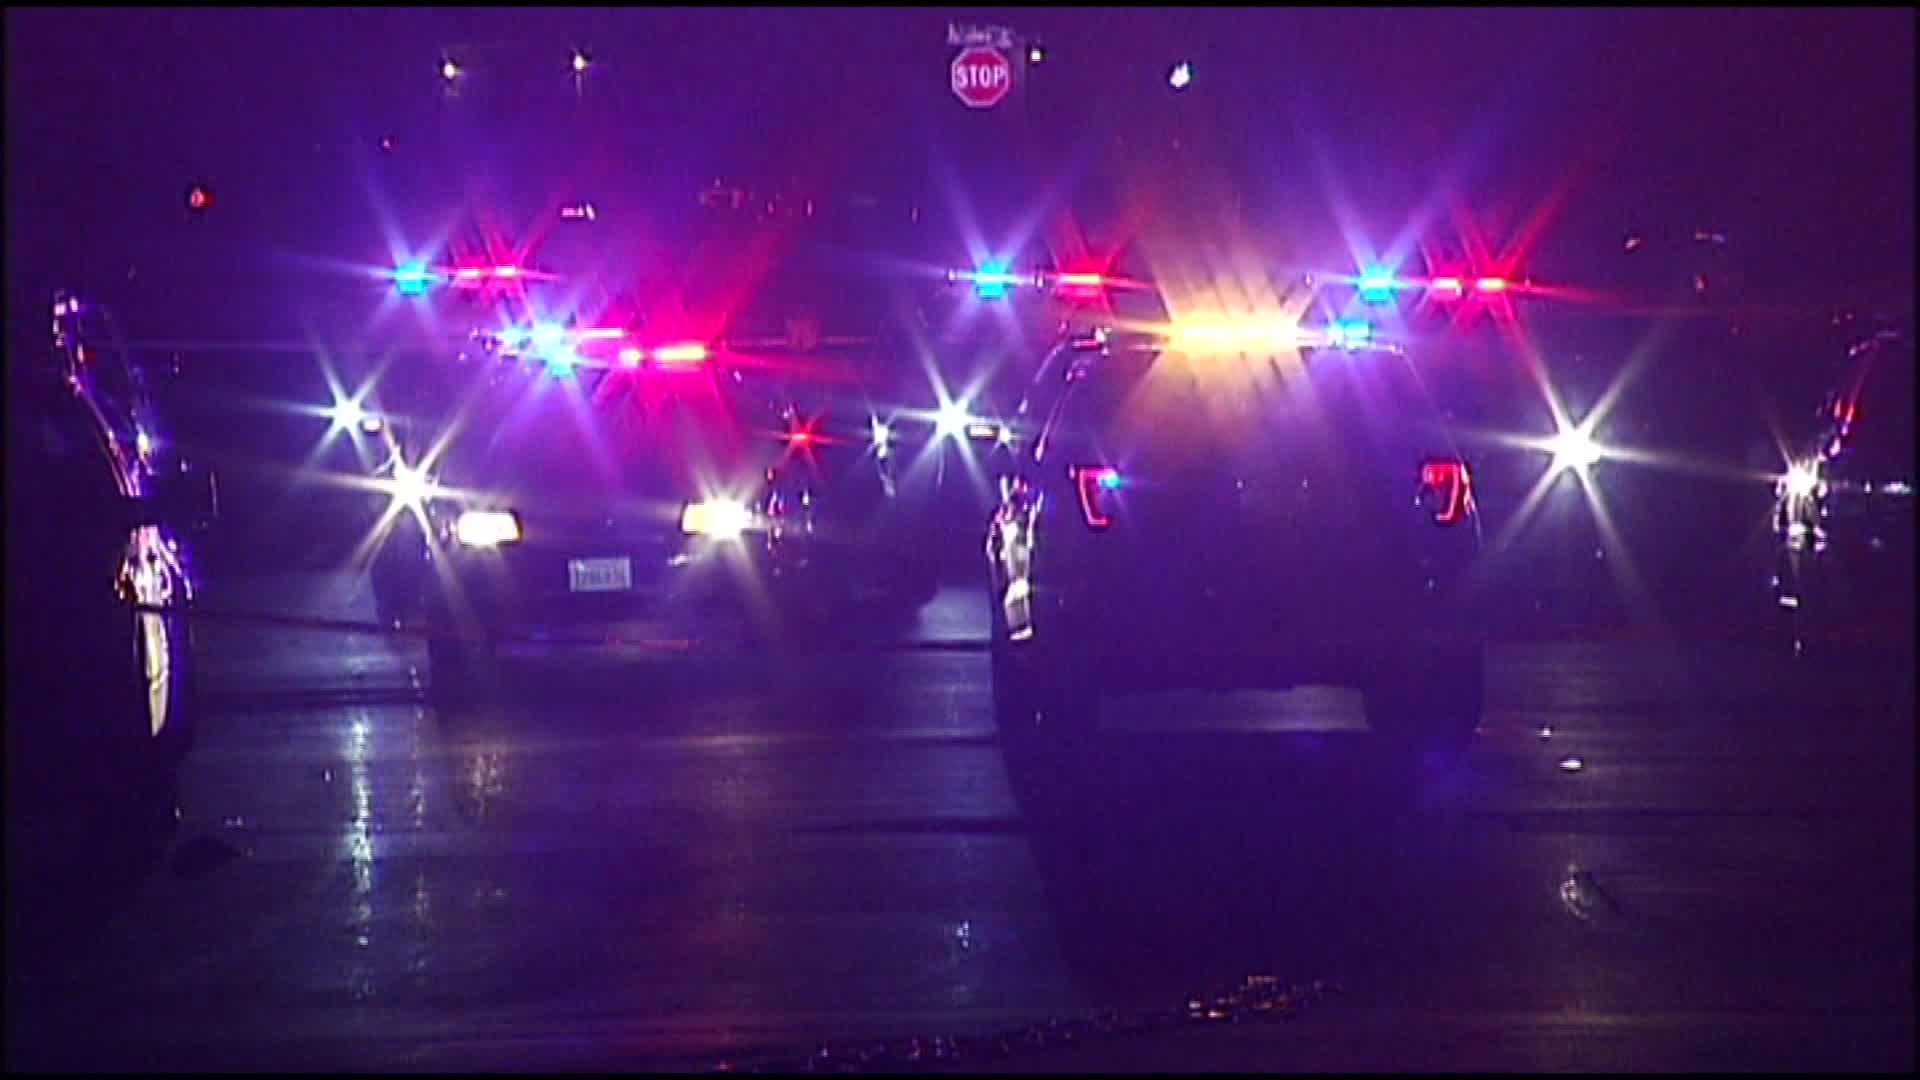 Man killed in Antioch officer involved shooting